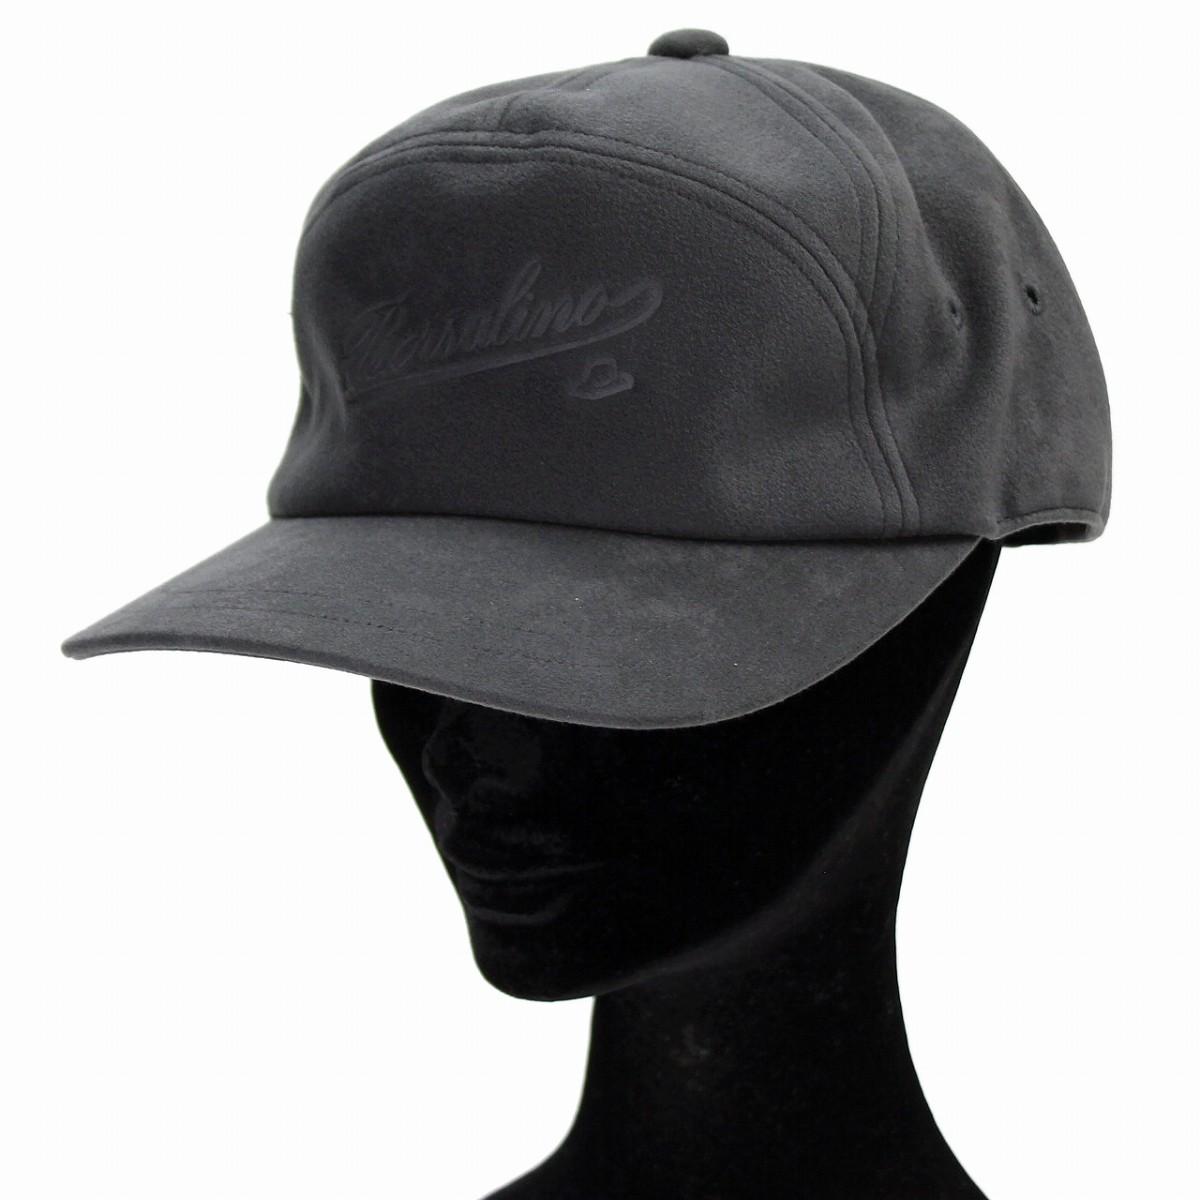 842317c6655 The cap men Borsalino hat size logo cap adult Shin pull plain fabric S M L  LL 3L back adjuster size adjustable   gray  baseball cap  Christmas present  ...